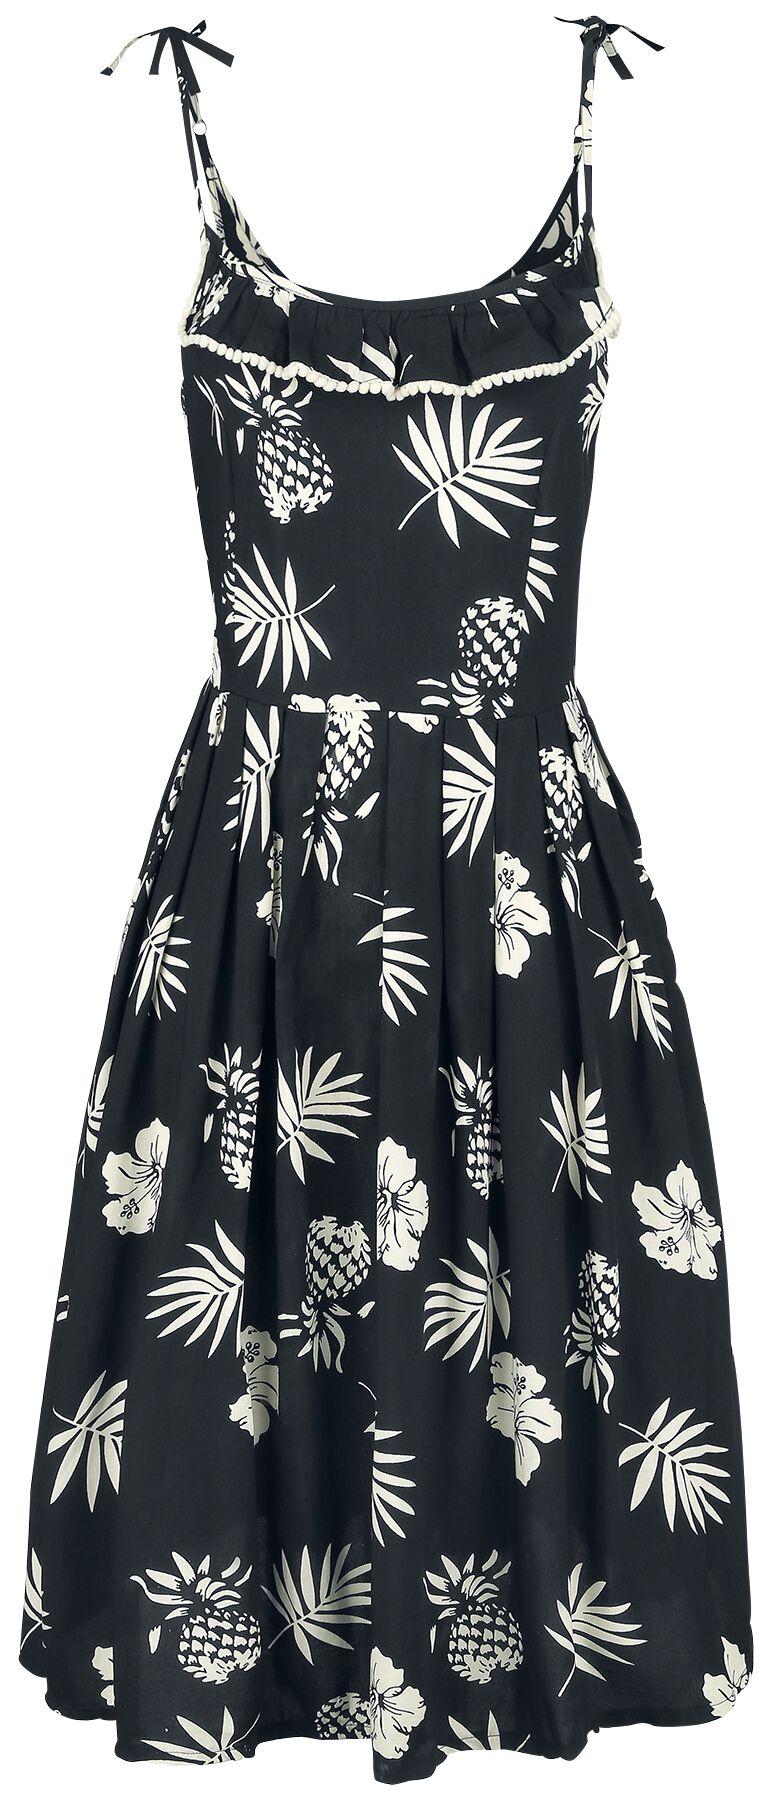 Kleider - Hell Bunny Tropicana Dress Mittellanges Kleid multicolor  - Onlineshop EMP